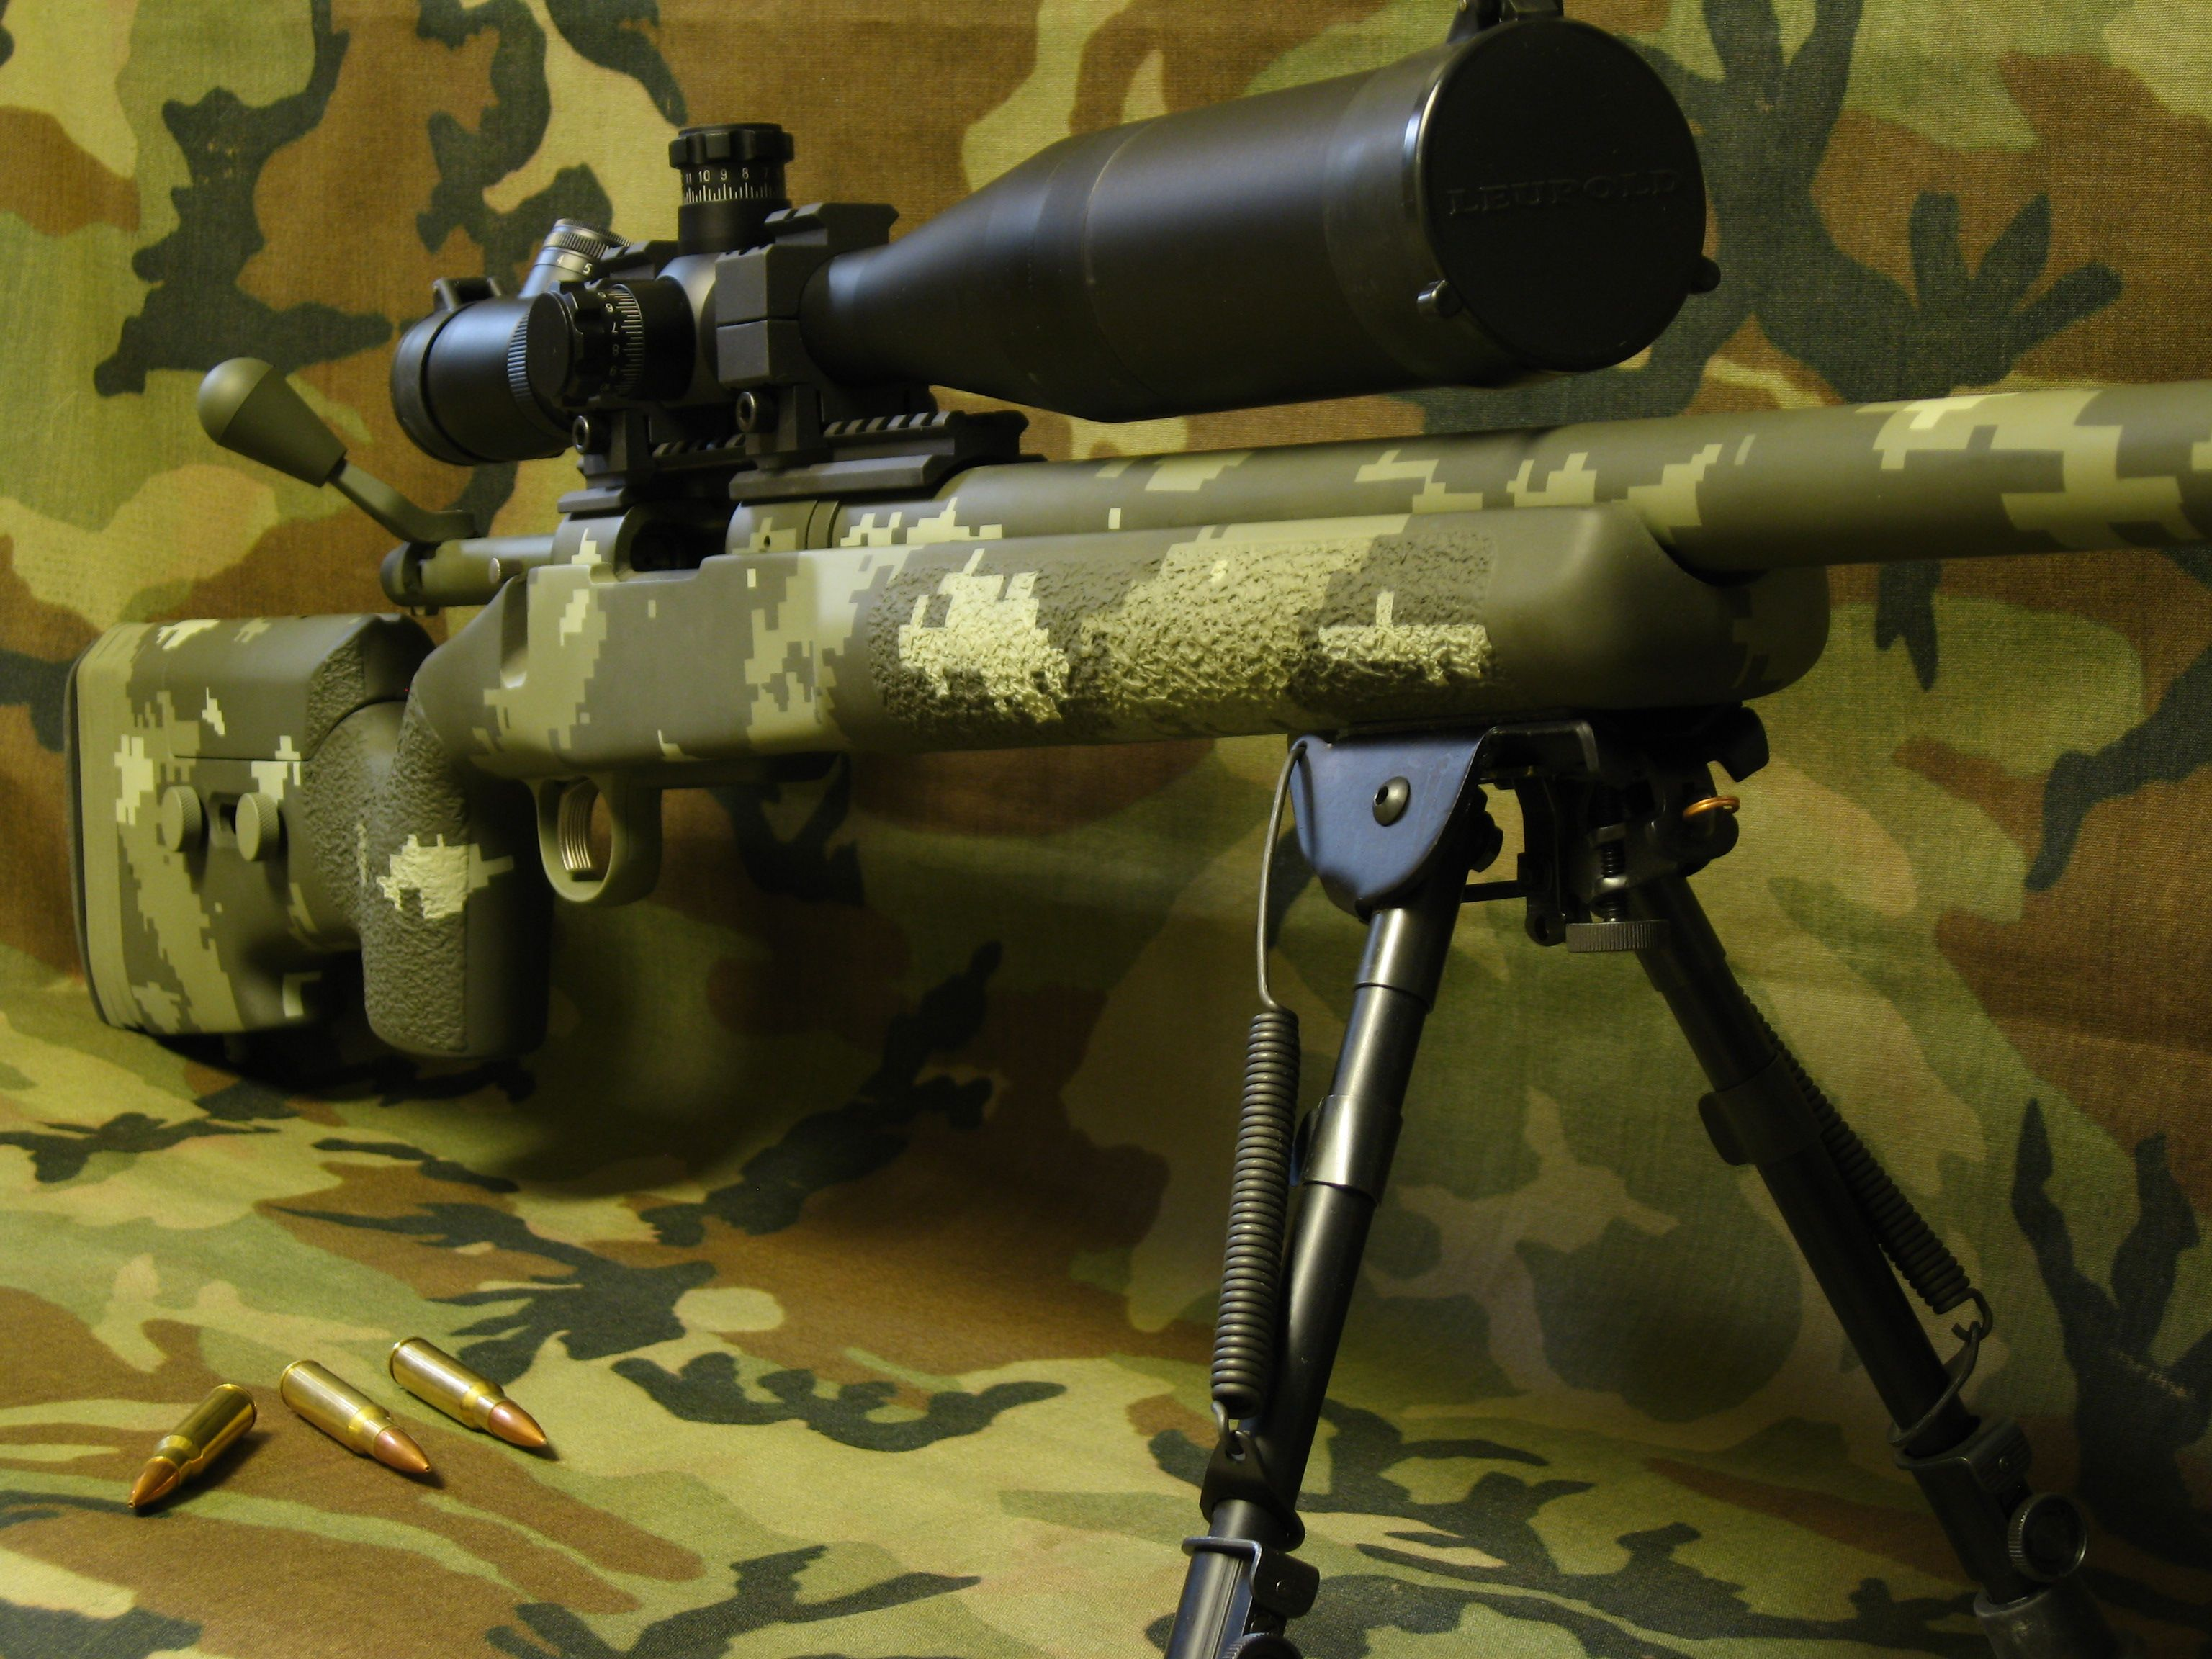 Gruning Precision: tactical rifles, Remington 700, M1A ... M14 Tactical Sniper Rifle